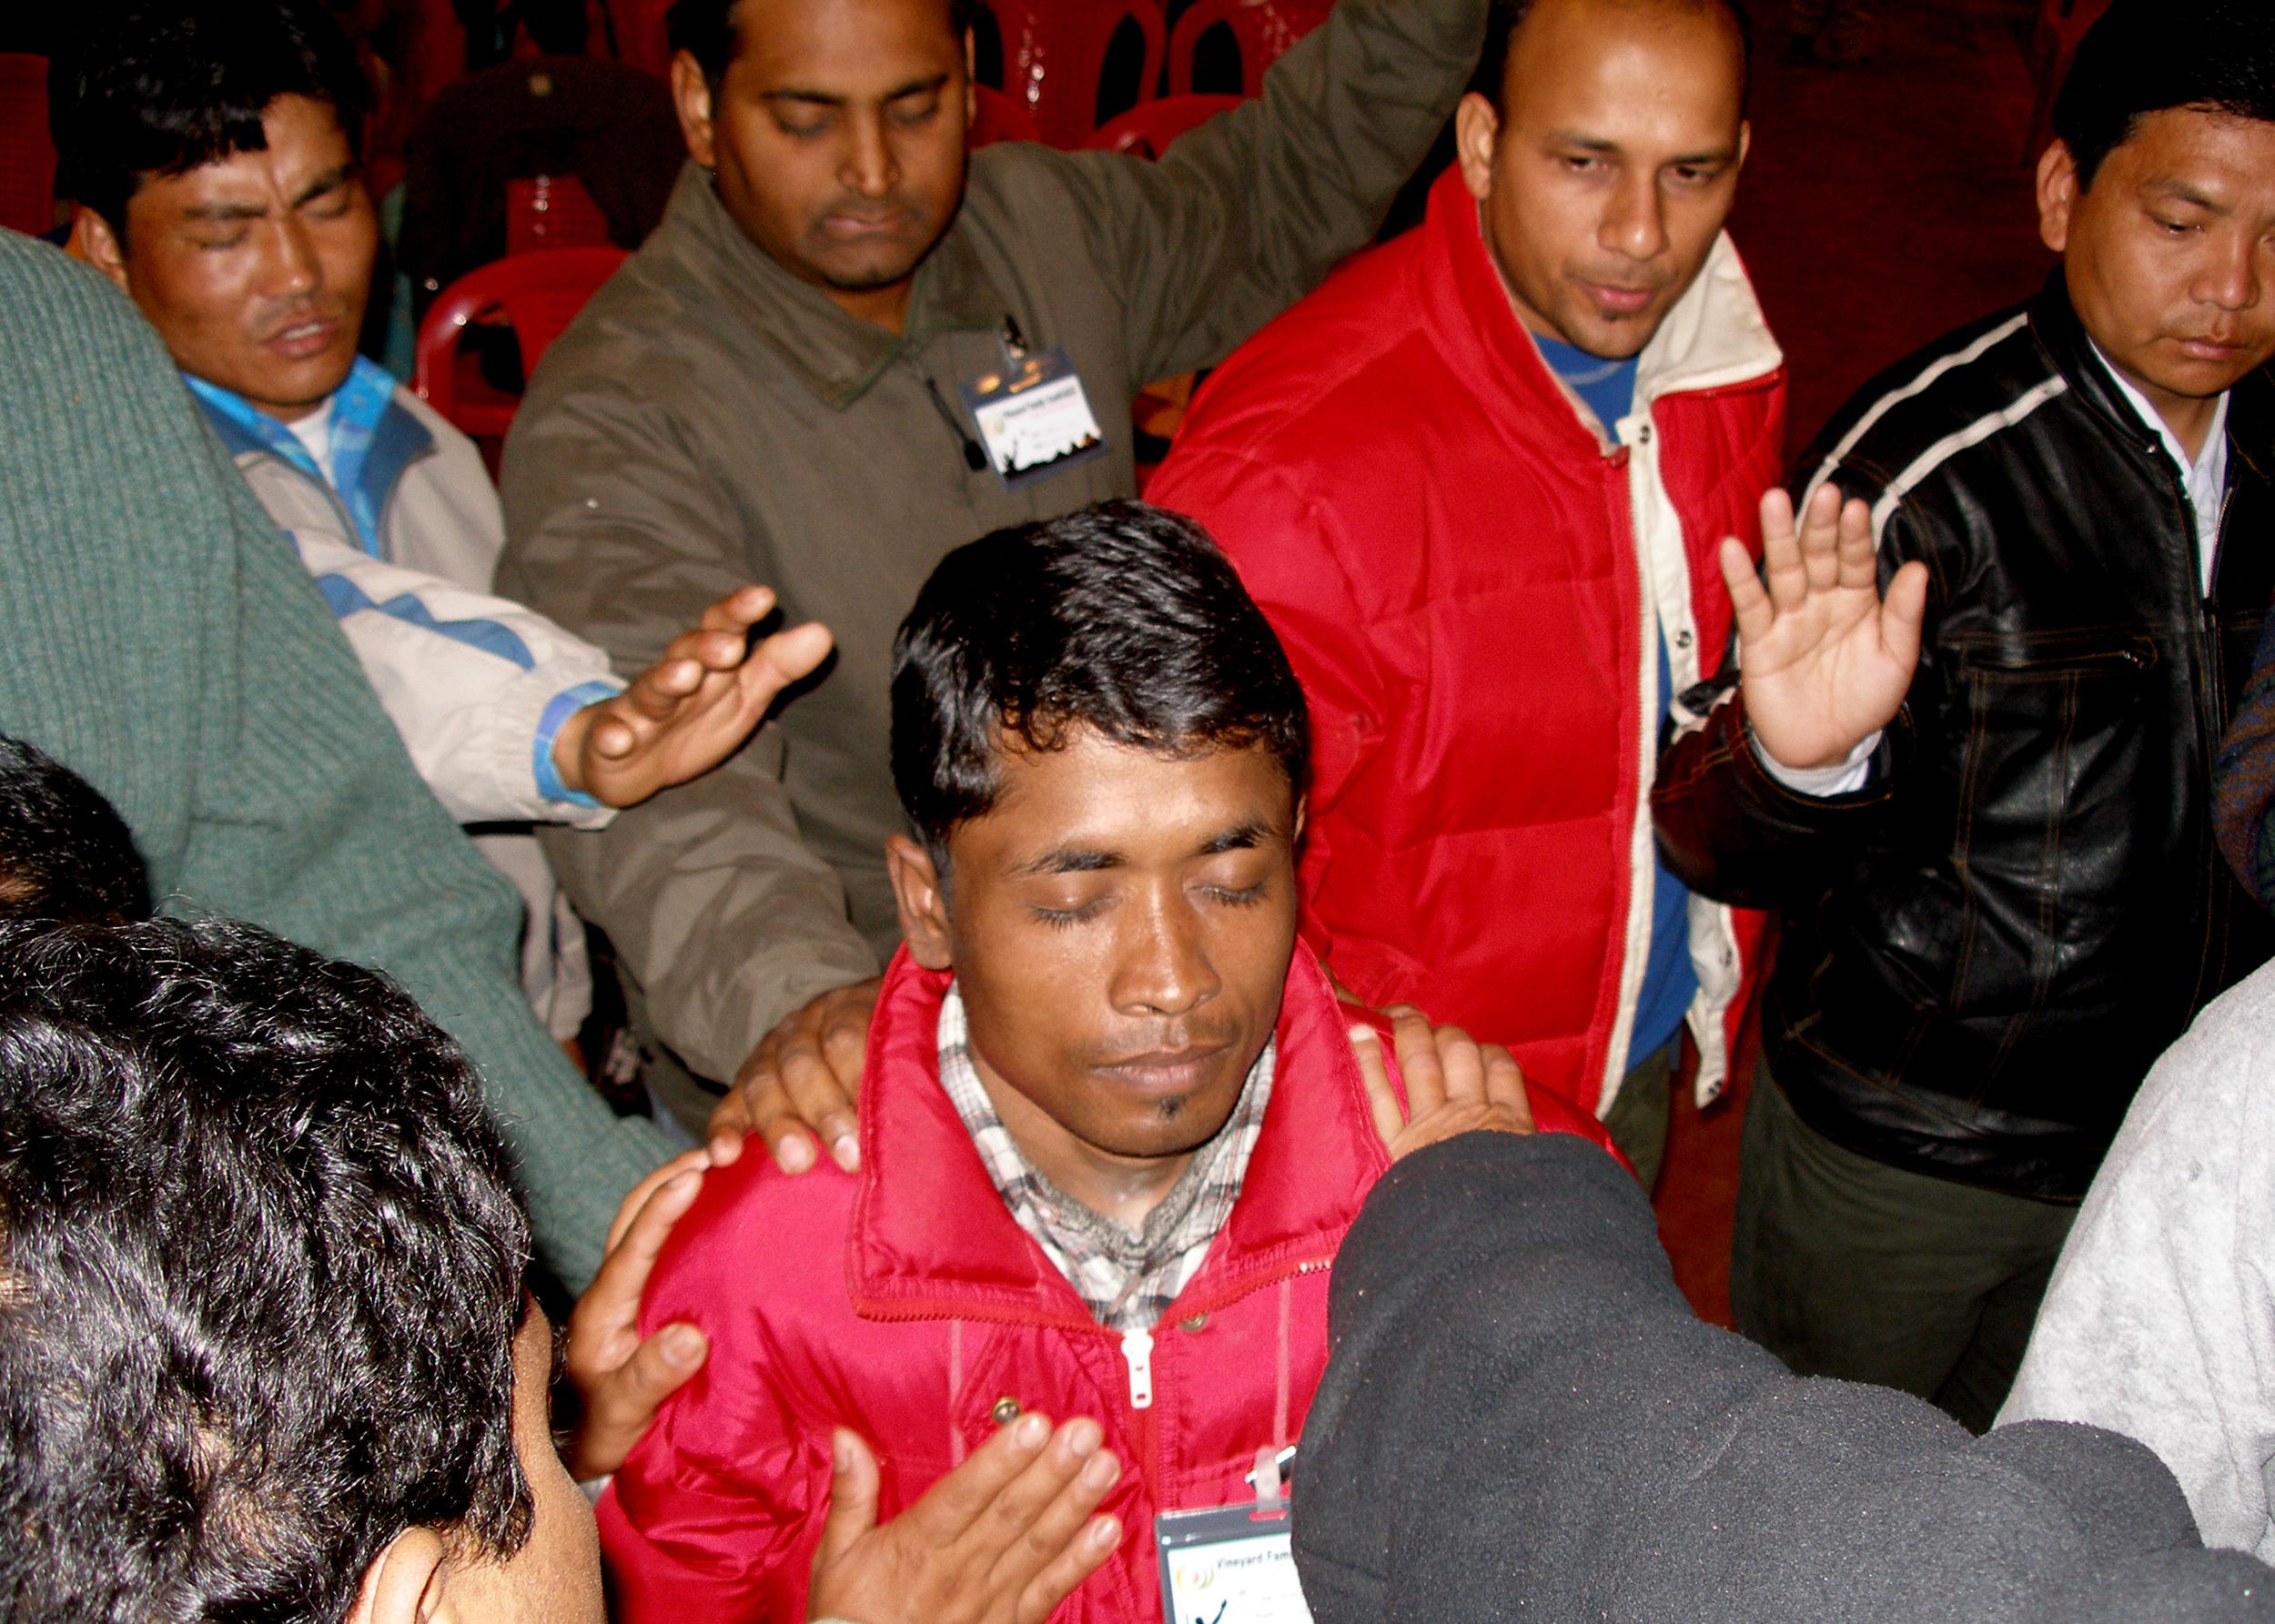 INDIA+-+Group+praying+over+a+man.jpg